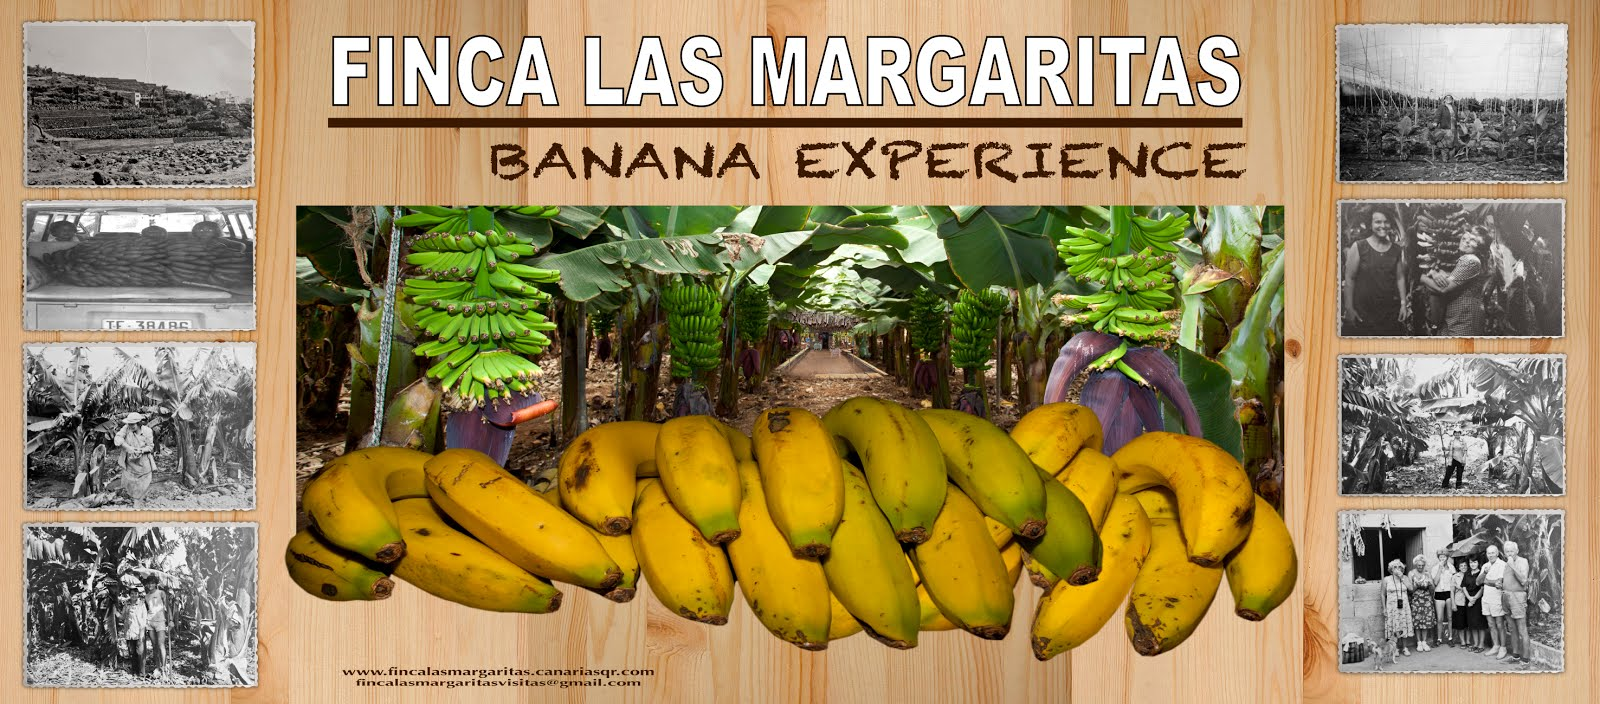 .FINCA LAS MARGARITAS, Banana Experience